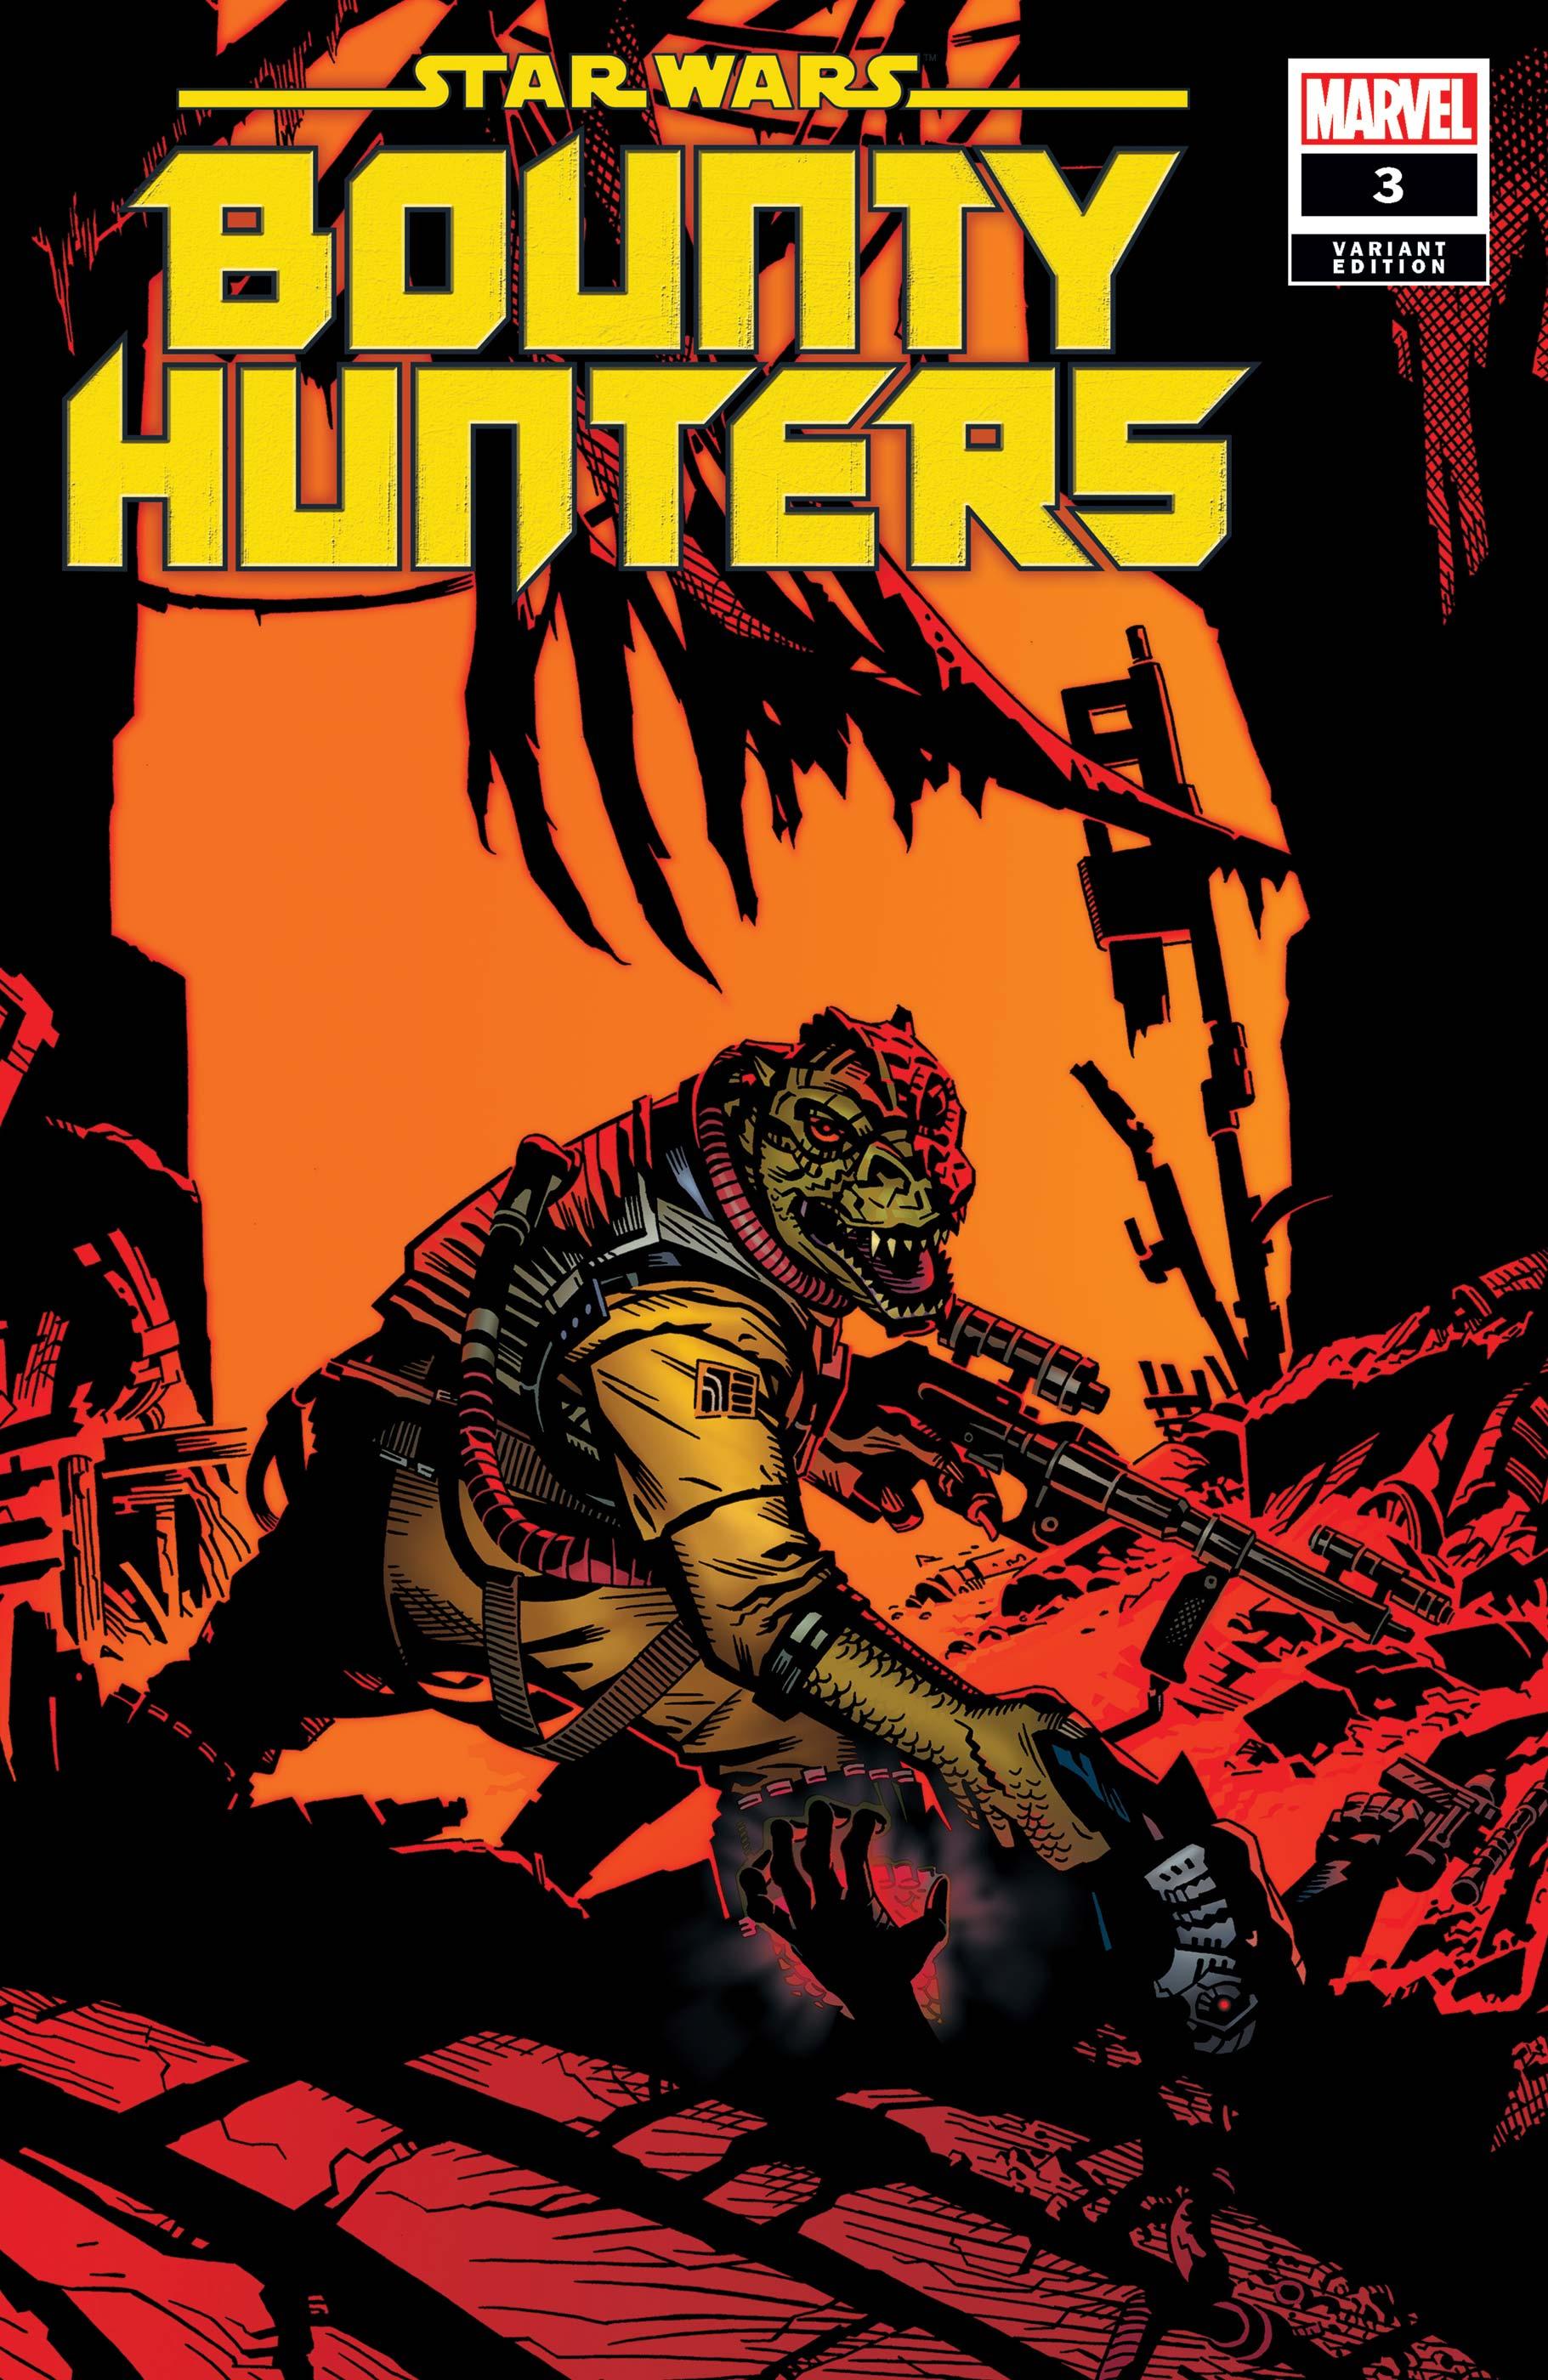 Star Wars: Bounty Hunters (2020) #3 (Variant)